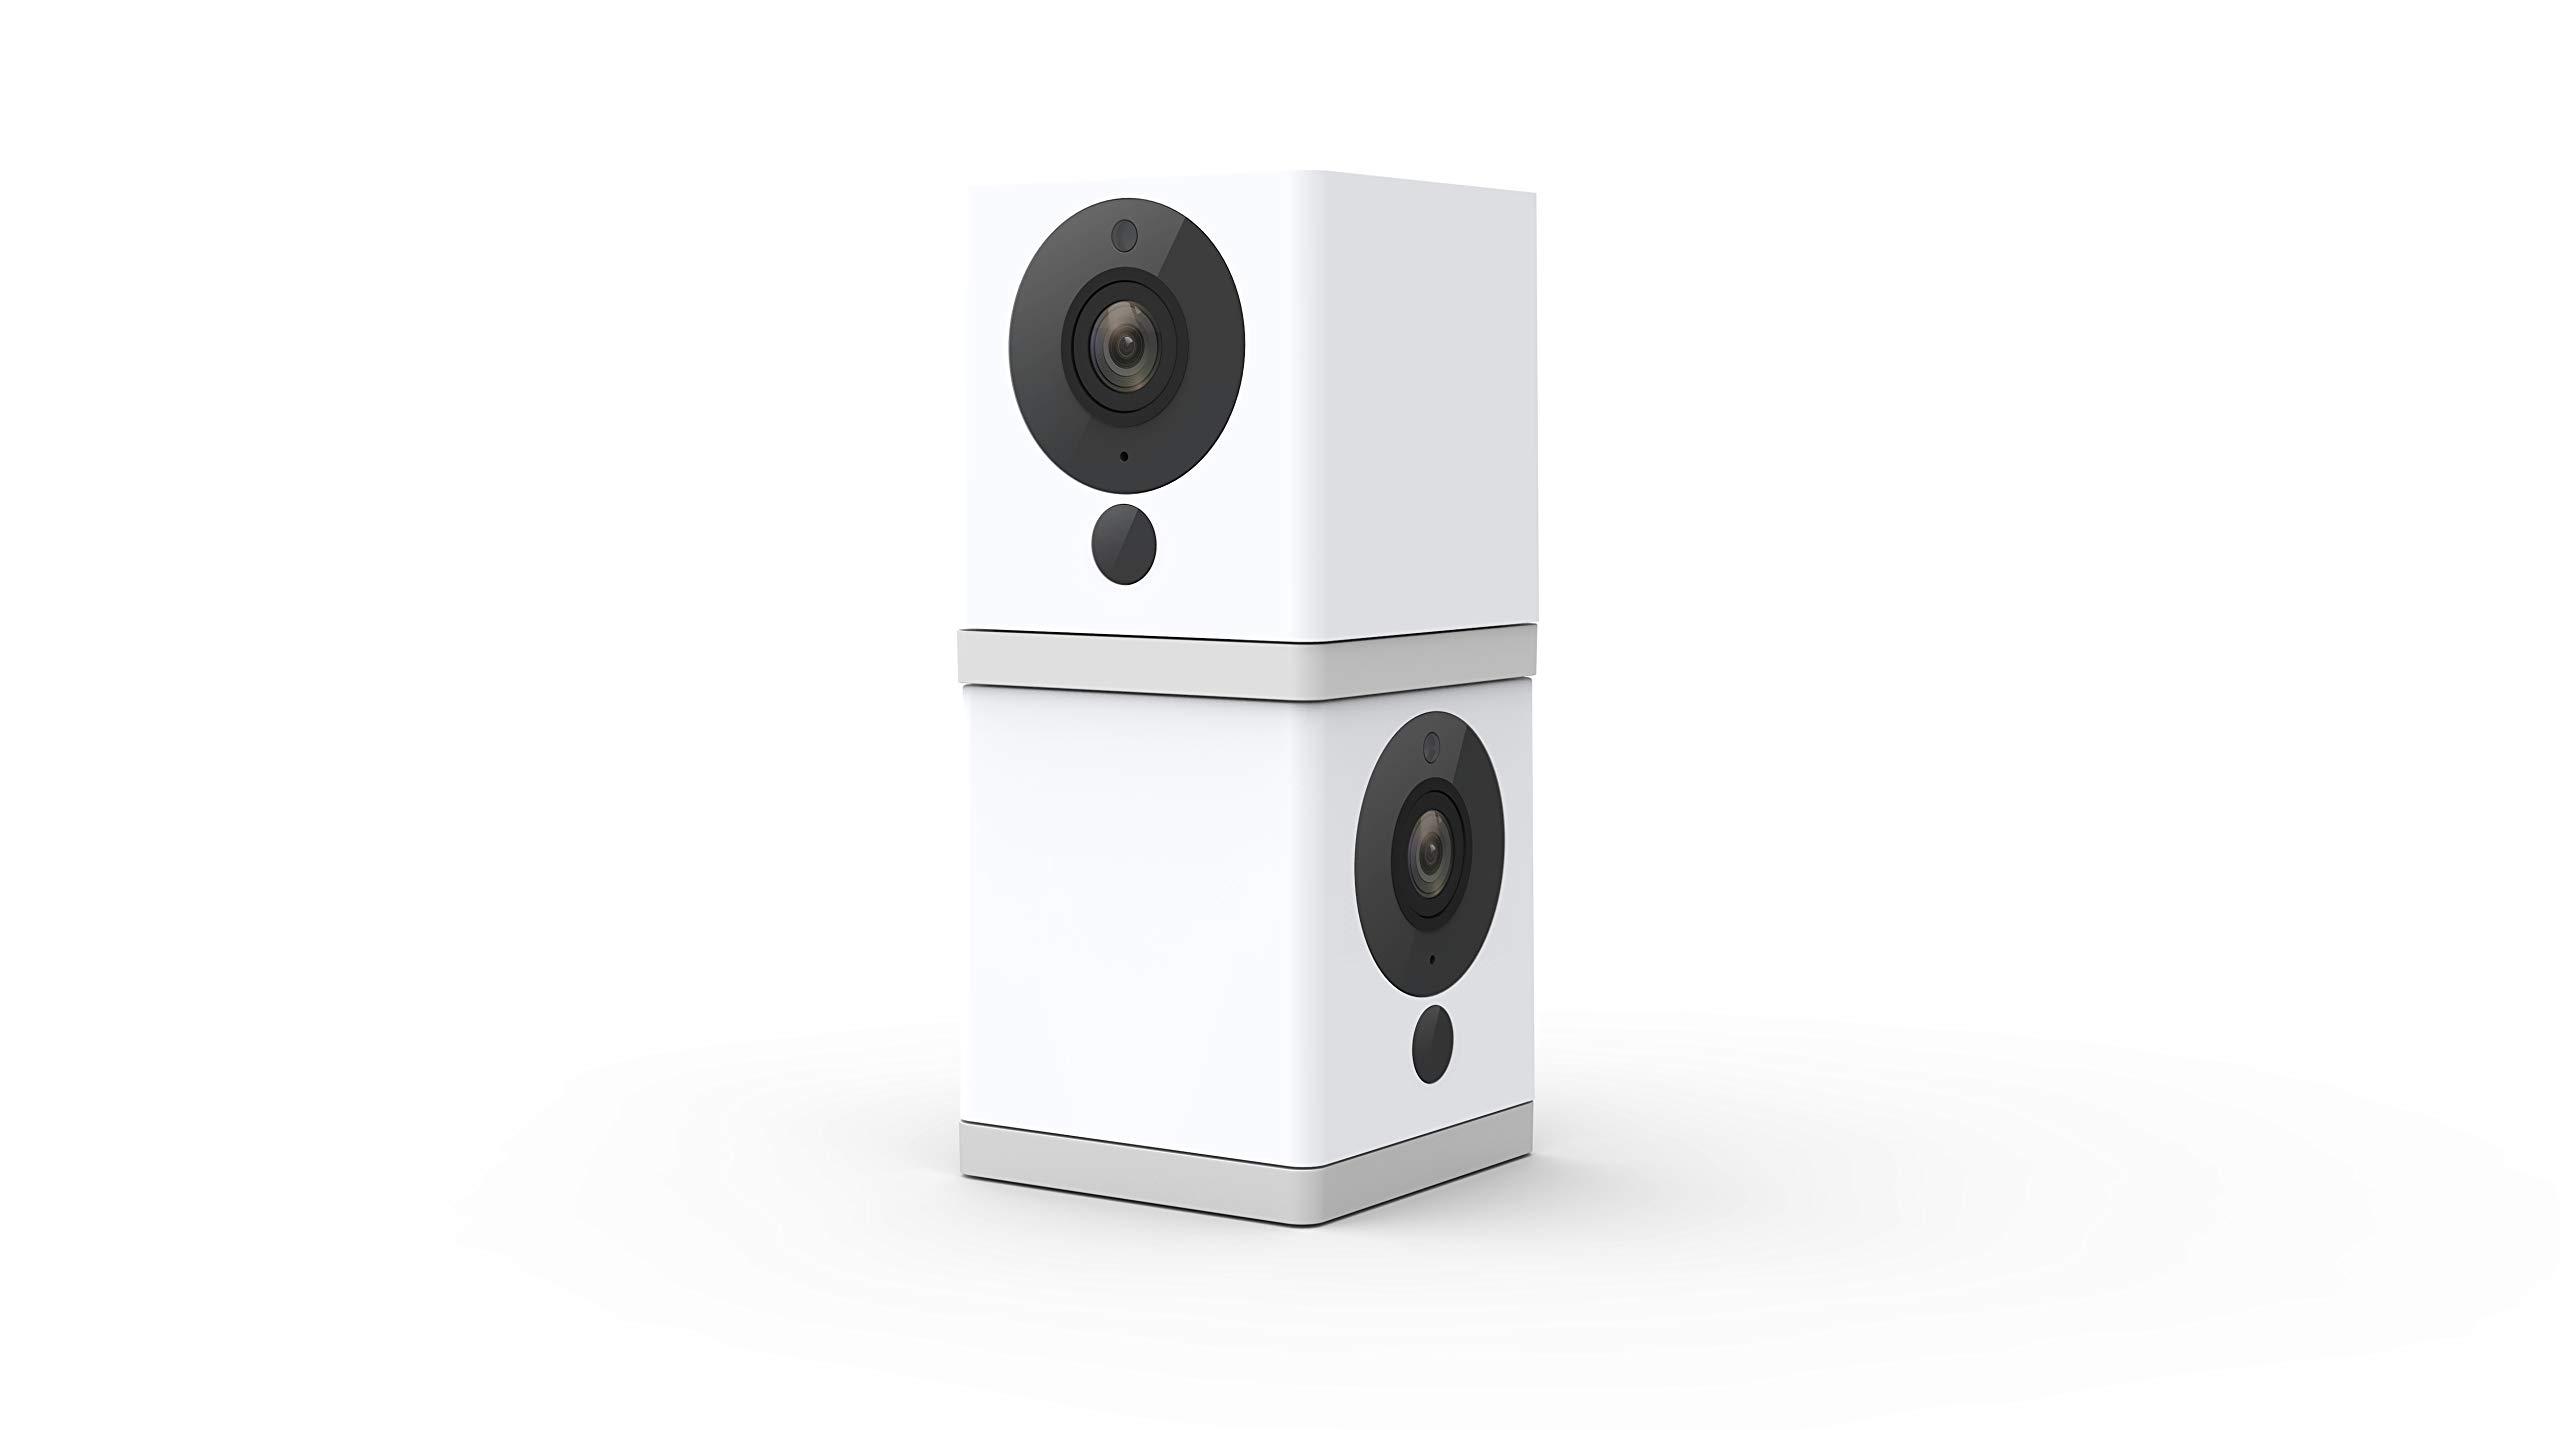 كاميرا واي فاي داخلية لاسلكية مع كاميرا